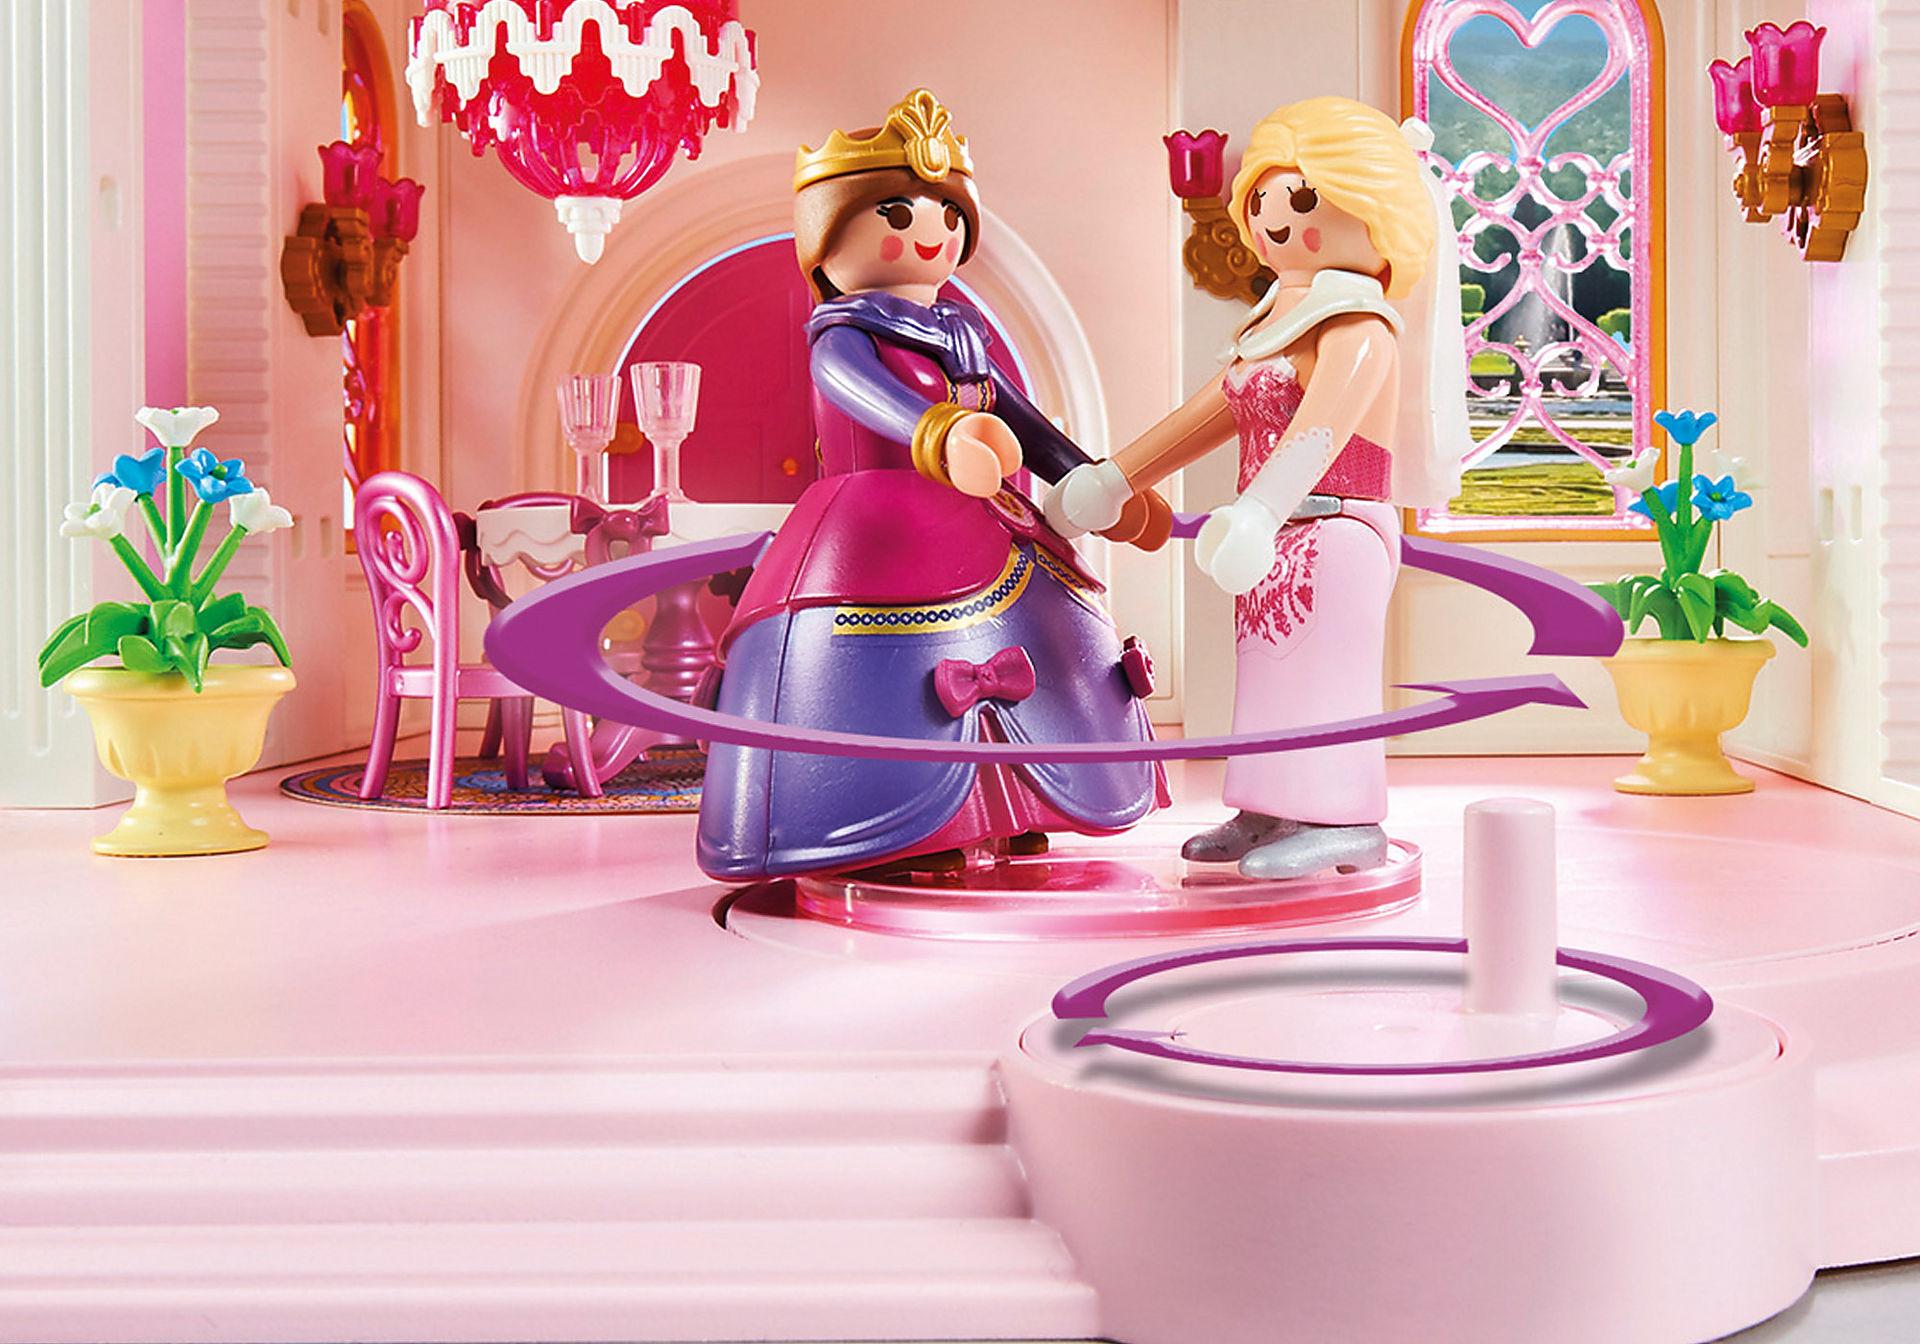 70447 Large Princess Castle zoom image8